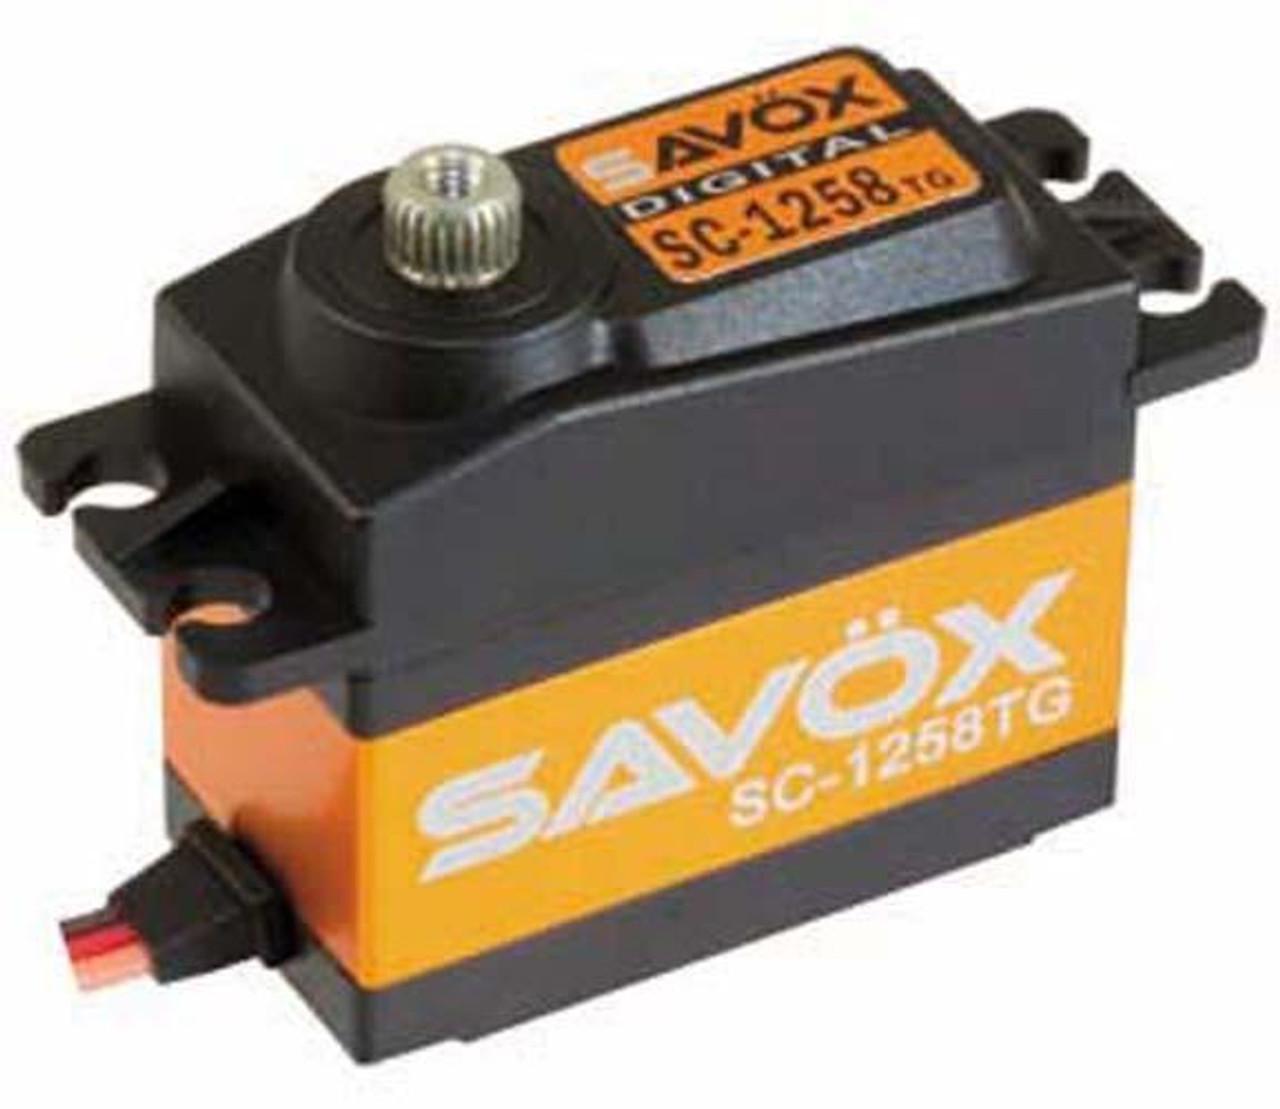 SC1258TG-BE Savox Black Edition Standard Size Coreless Digital Servo .08//166